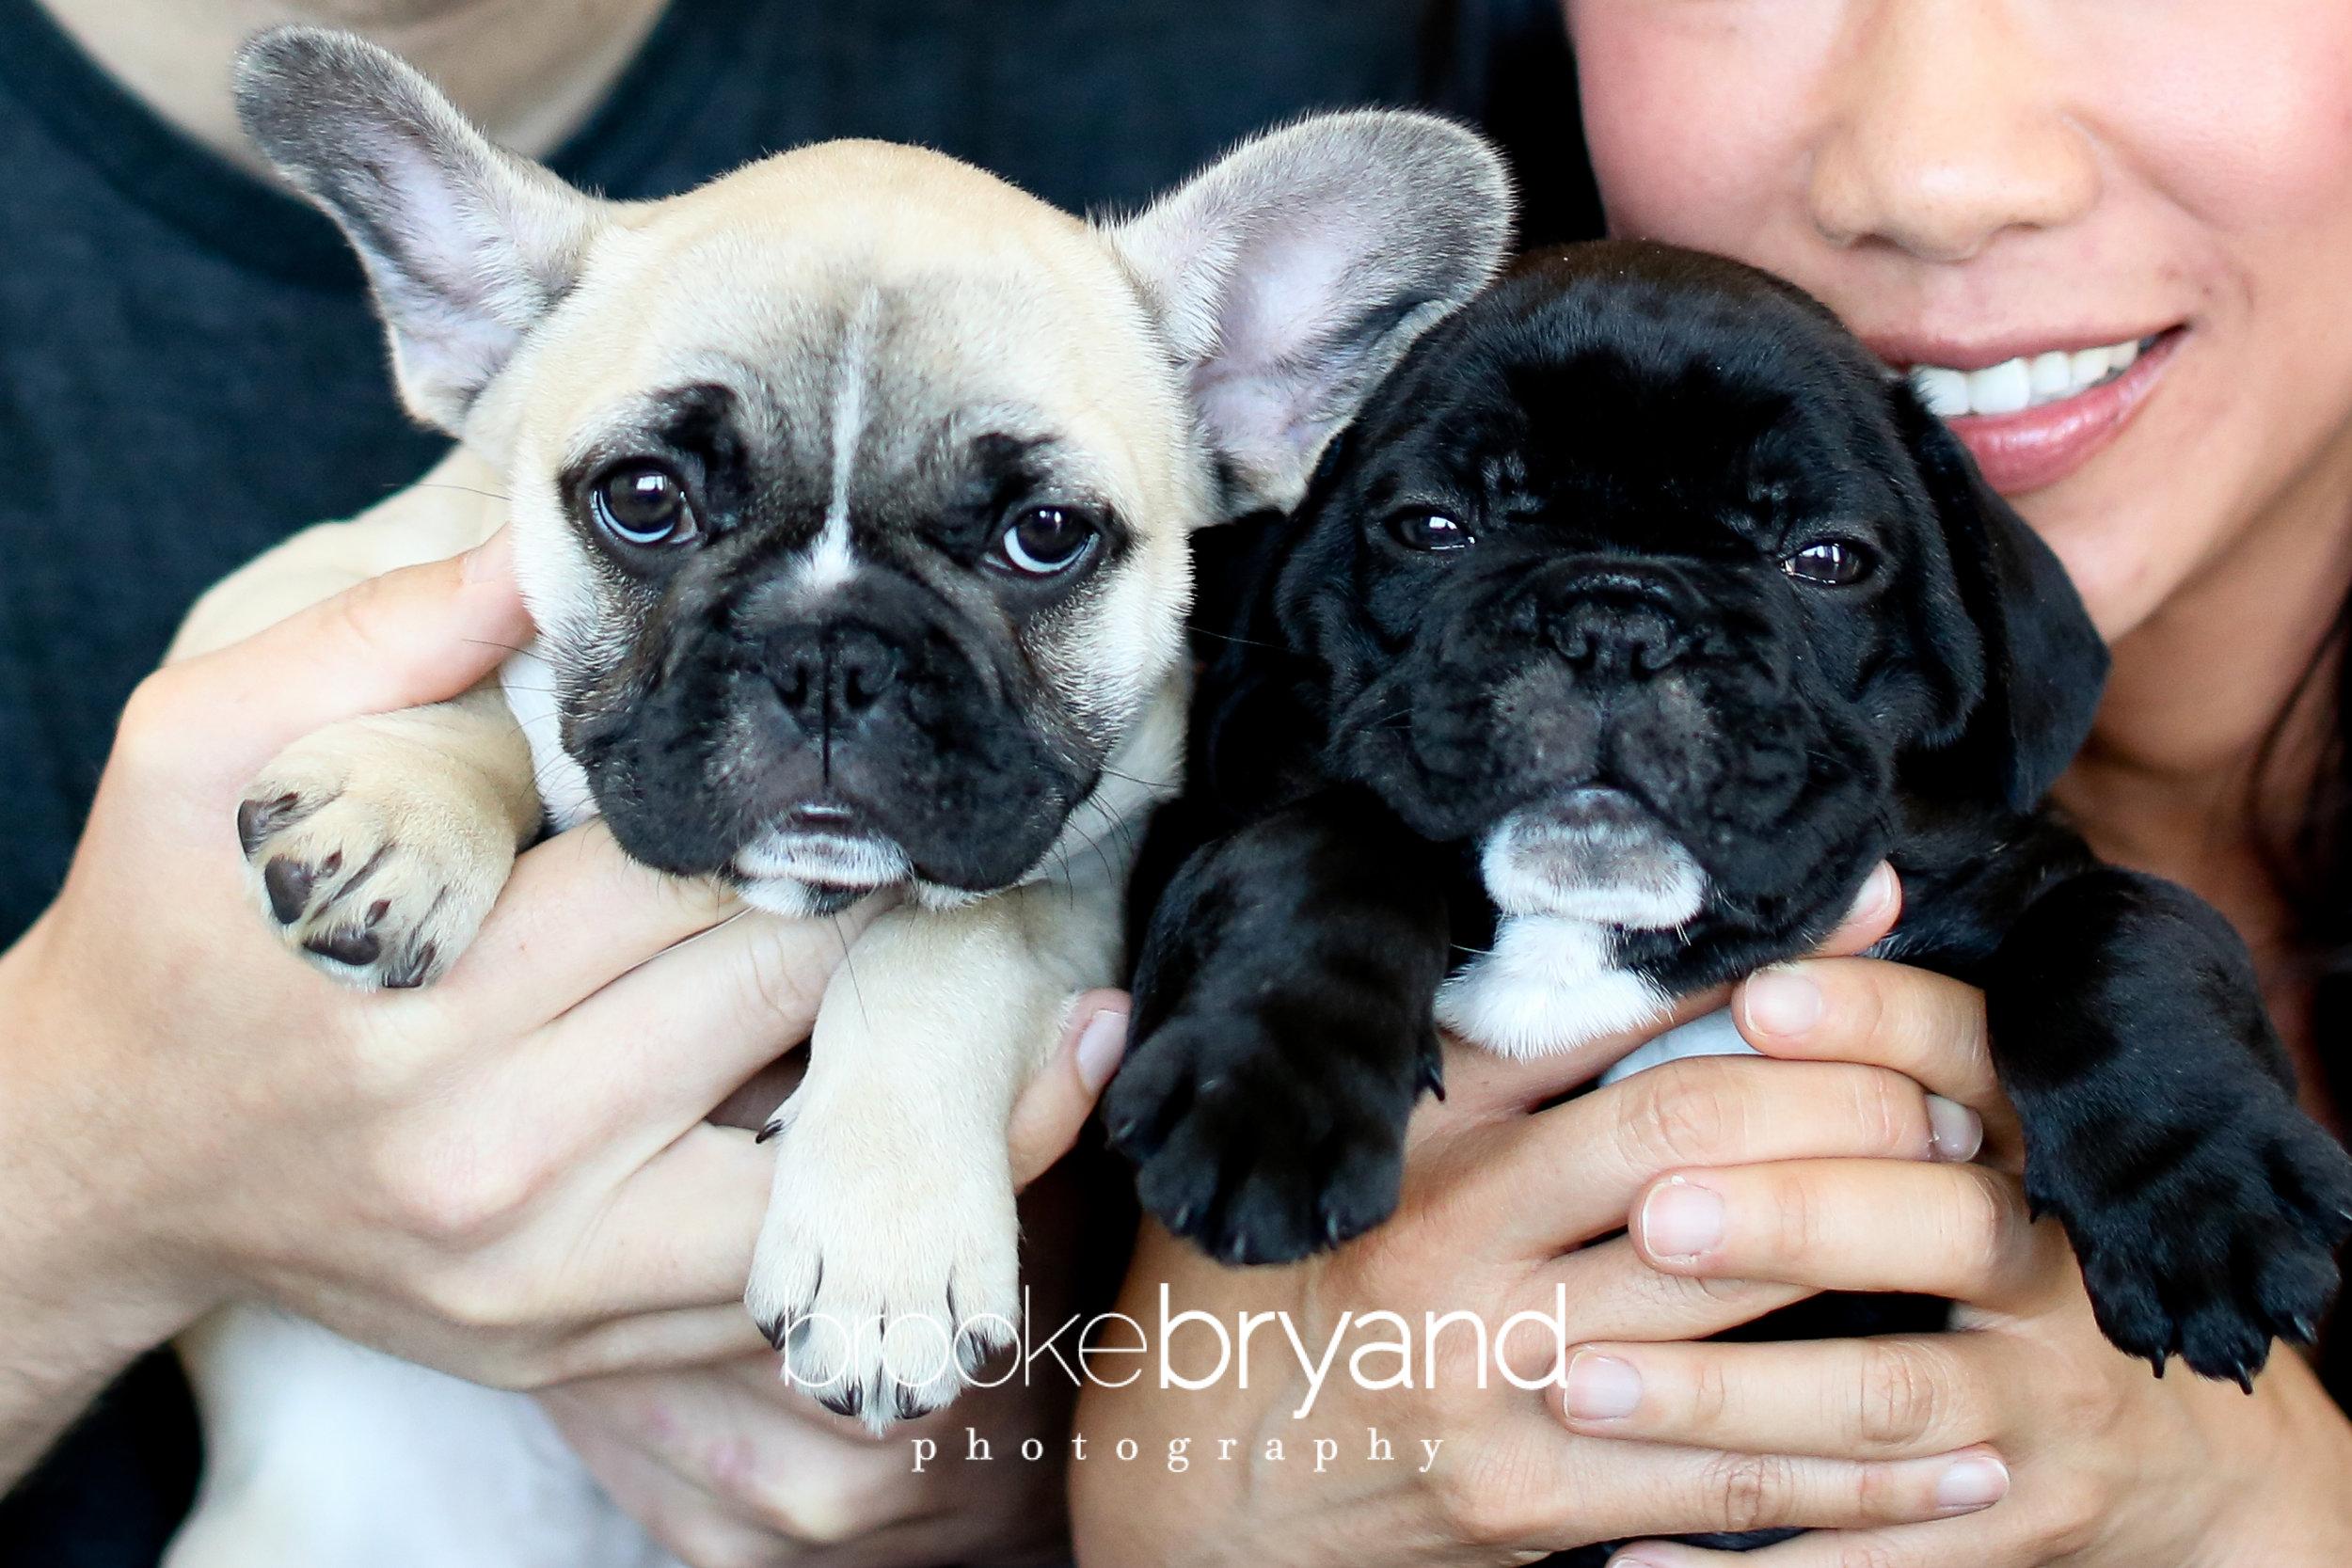 Brooke-Bryand-Photography-San-Francisco-Pet-Photographer-IMG_0043.jpg